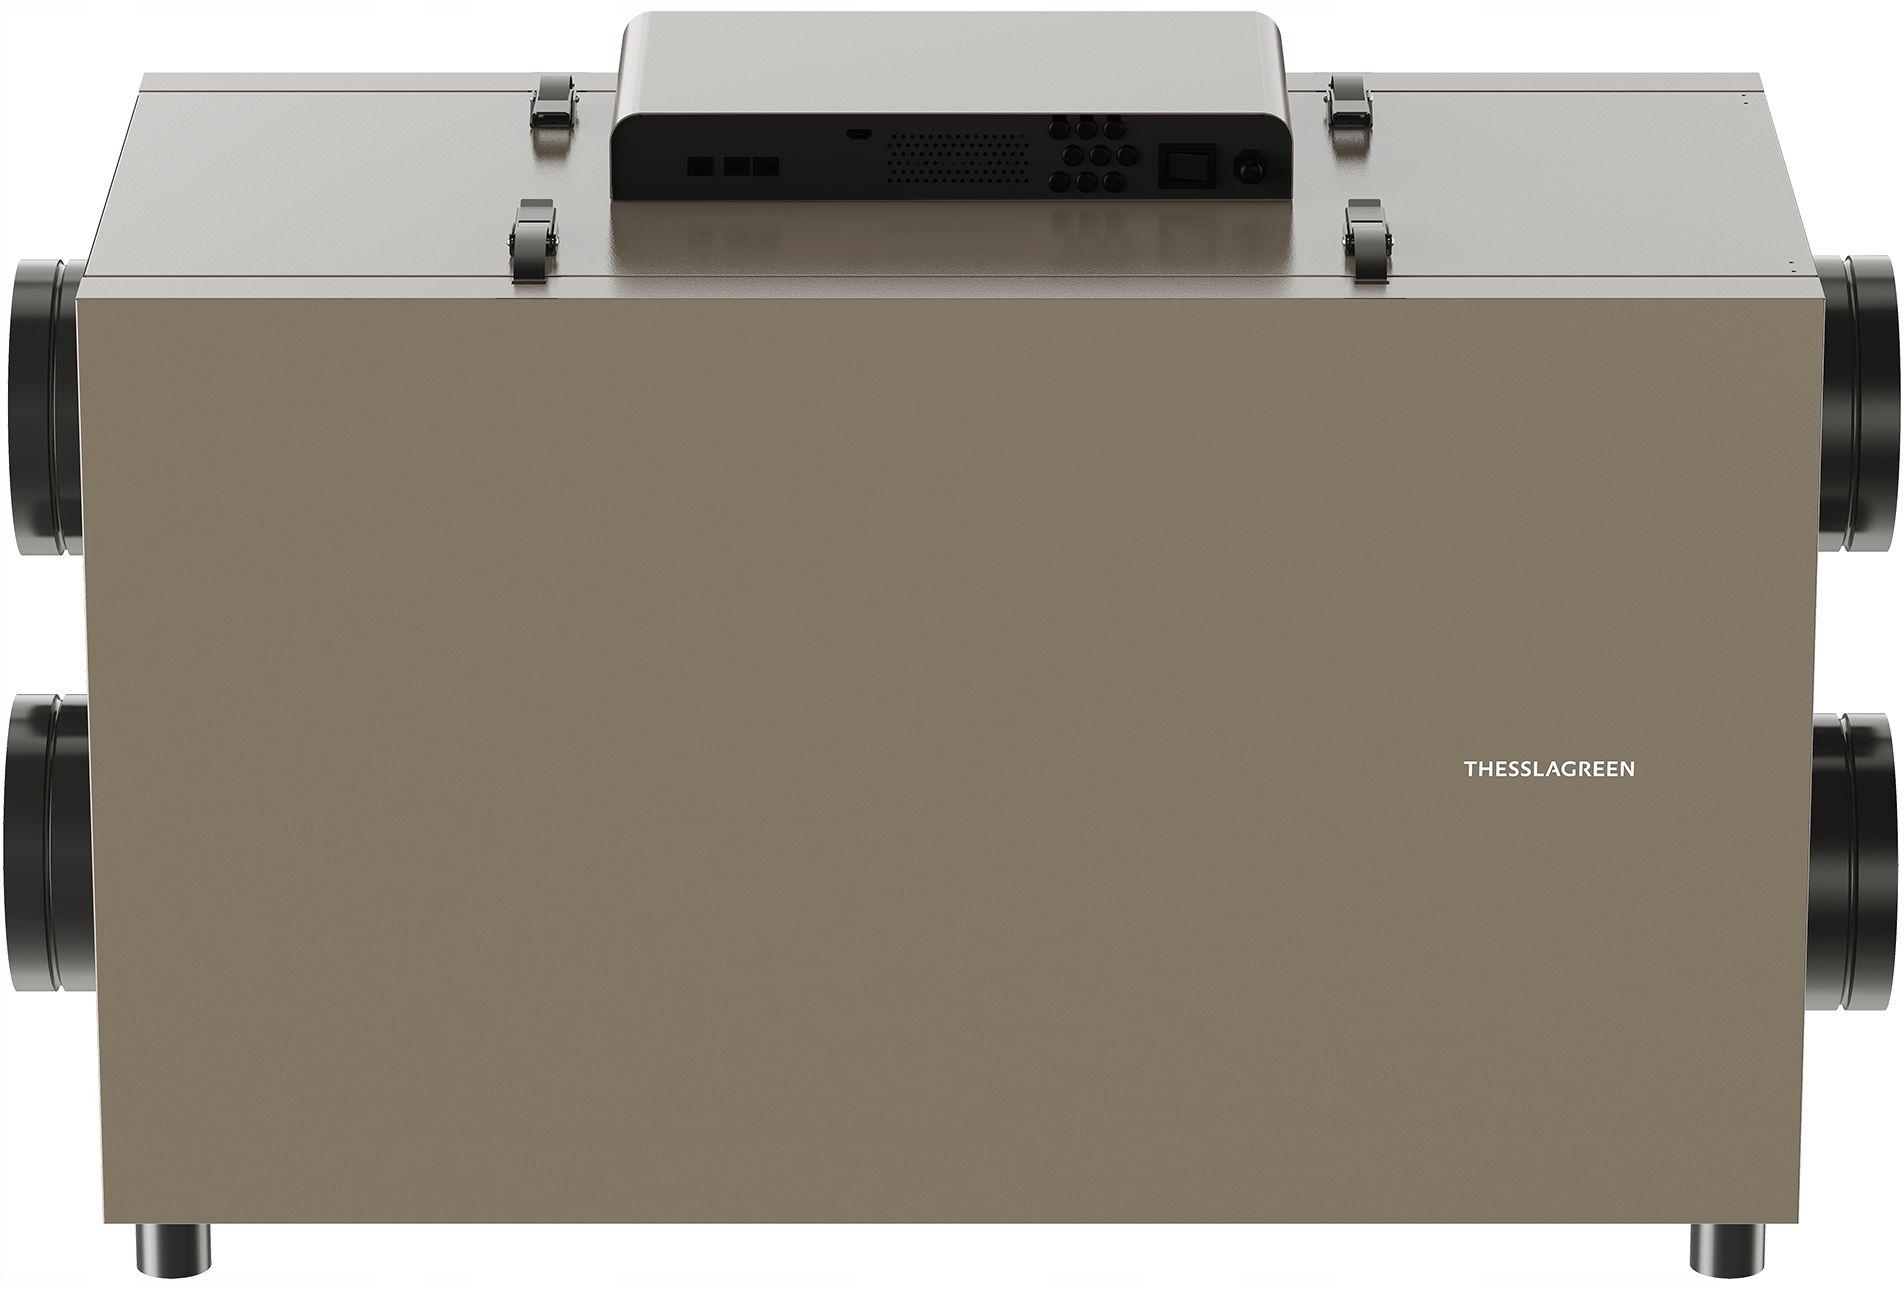 Rekuperator Thessla AP Home 400h Energy+ montaż Centrala wentylacyjna Thesslagreen AirPack Home 400h Energy+